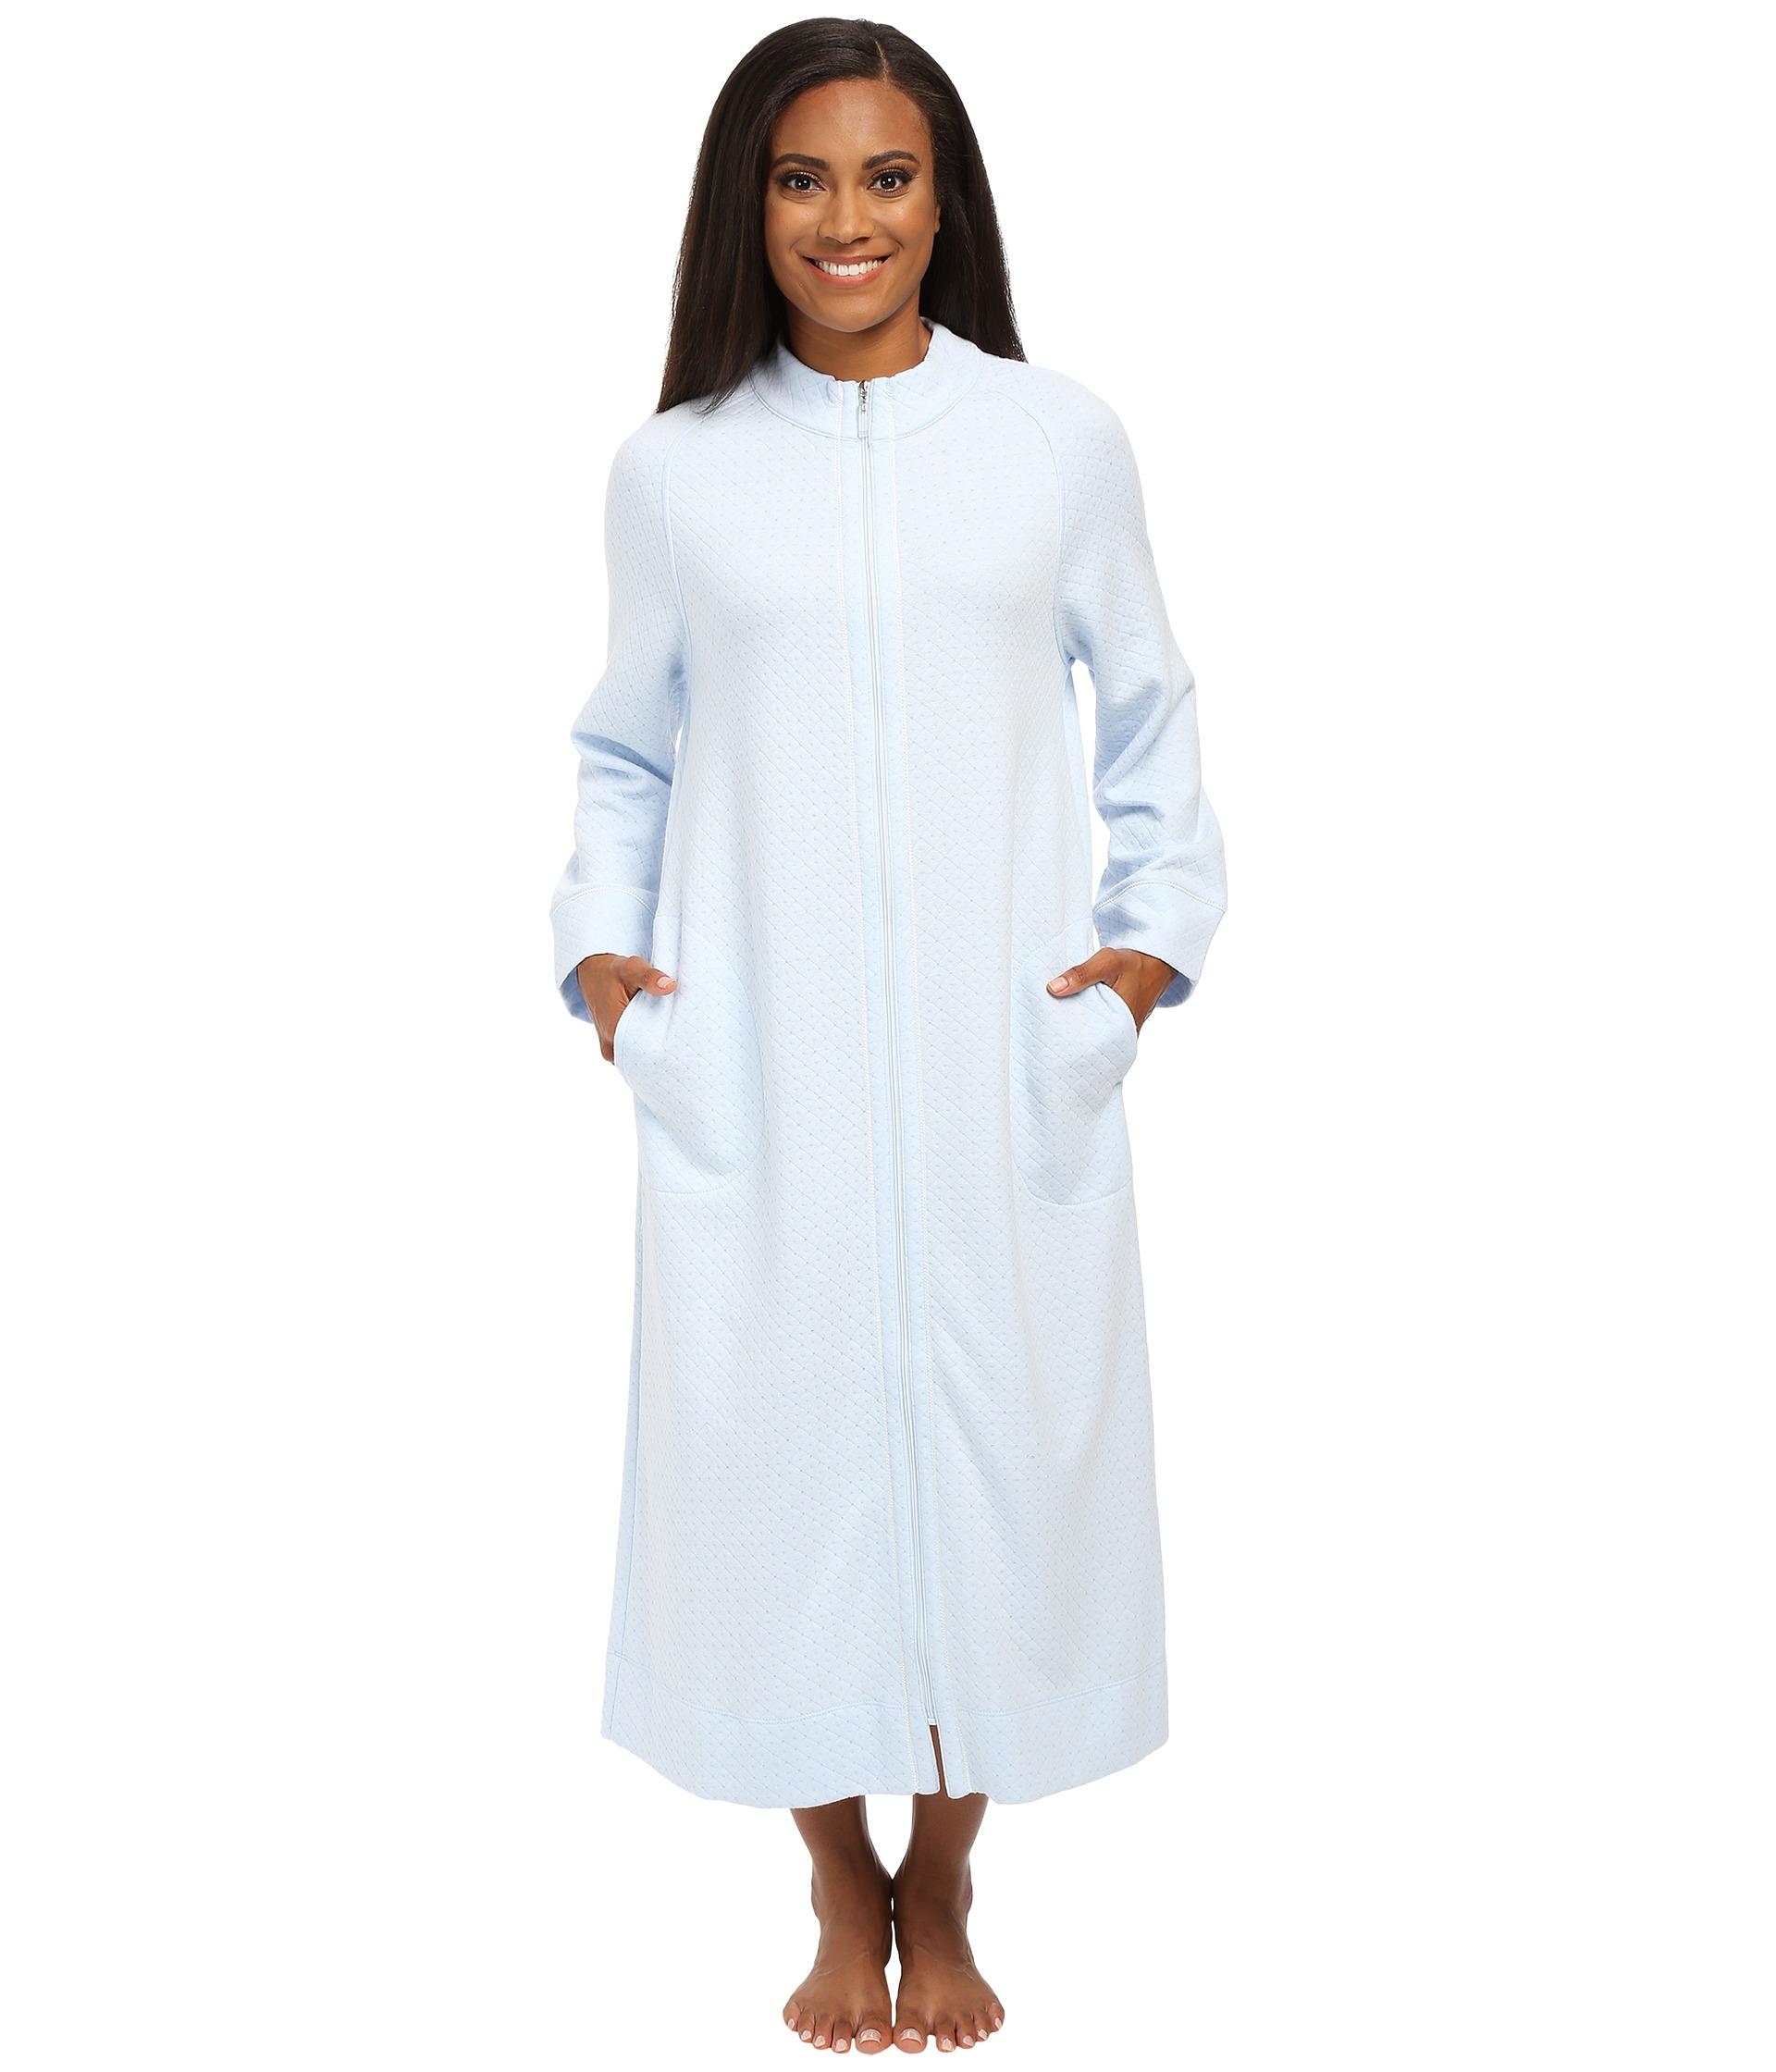 Petite robe with zipper